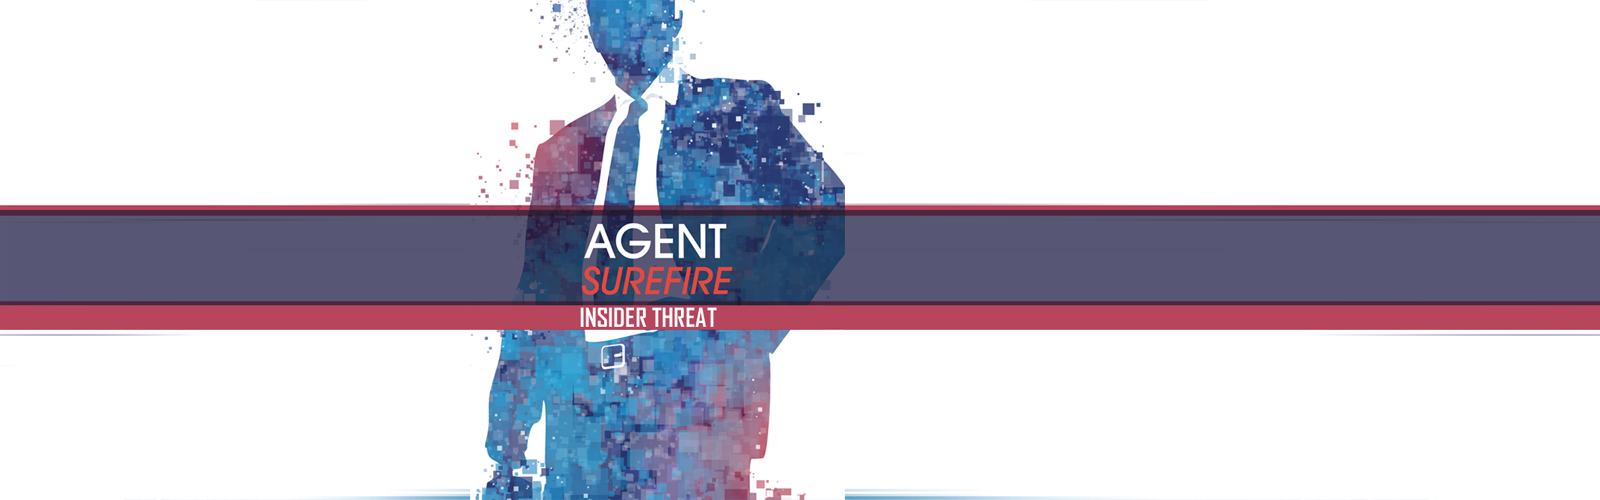 insider-threat-1600x500